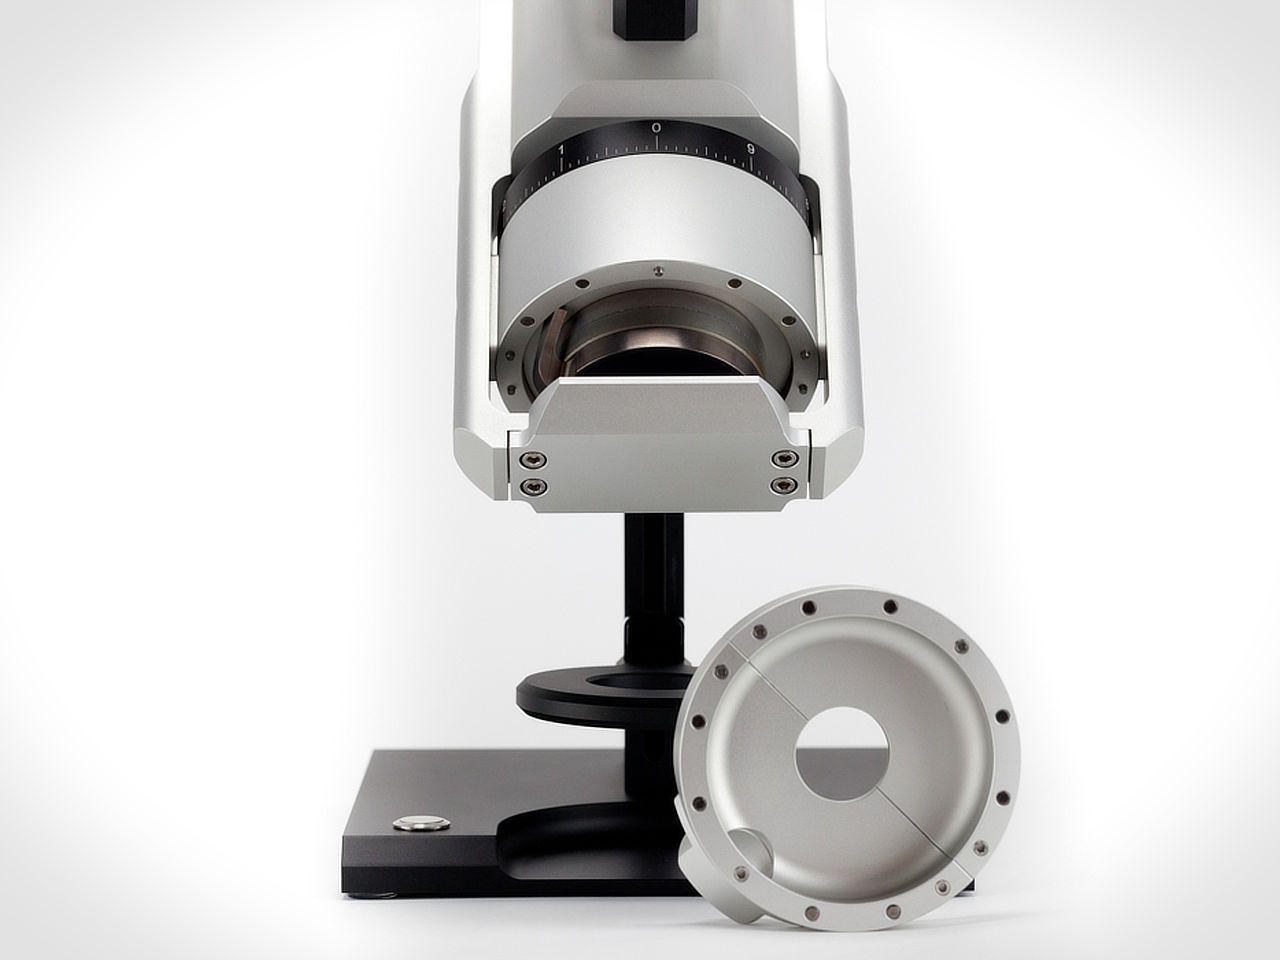 lyn-weber-eg1-coffee-grinder-003